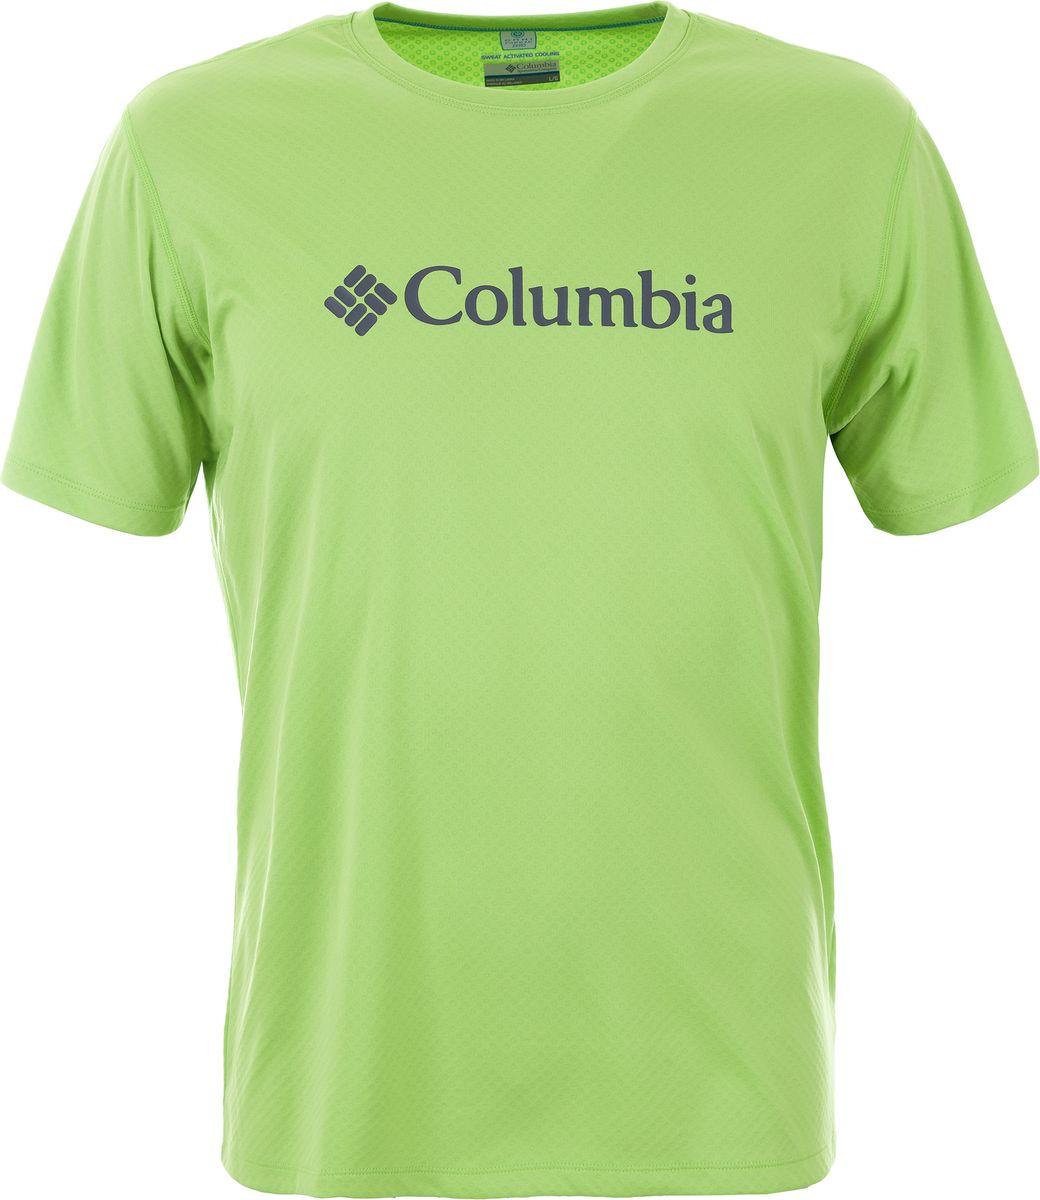 Купить Футболка мужская Columbia Zero Rules Short Sleeve Graphic Shirt, цвет: зеленый. 1533291-351. Размер L (48/50)